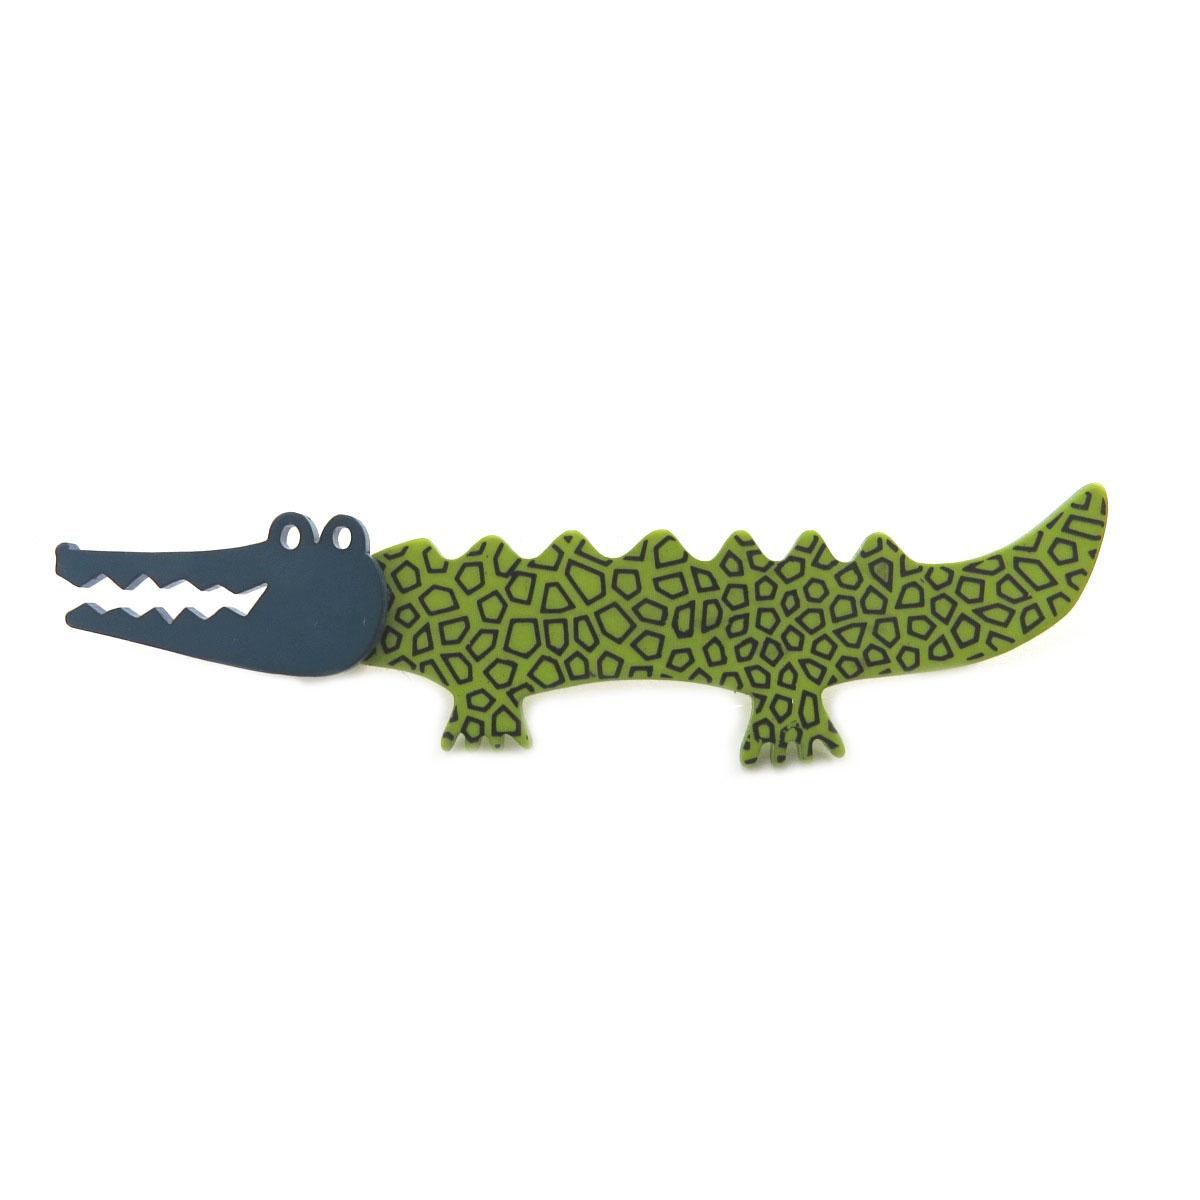 Broche artisanale \'Marionettes\' vert turquoise (crocodile) - 83x20 mm - [Q9702]